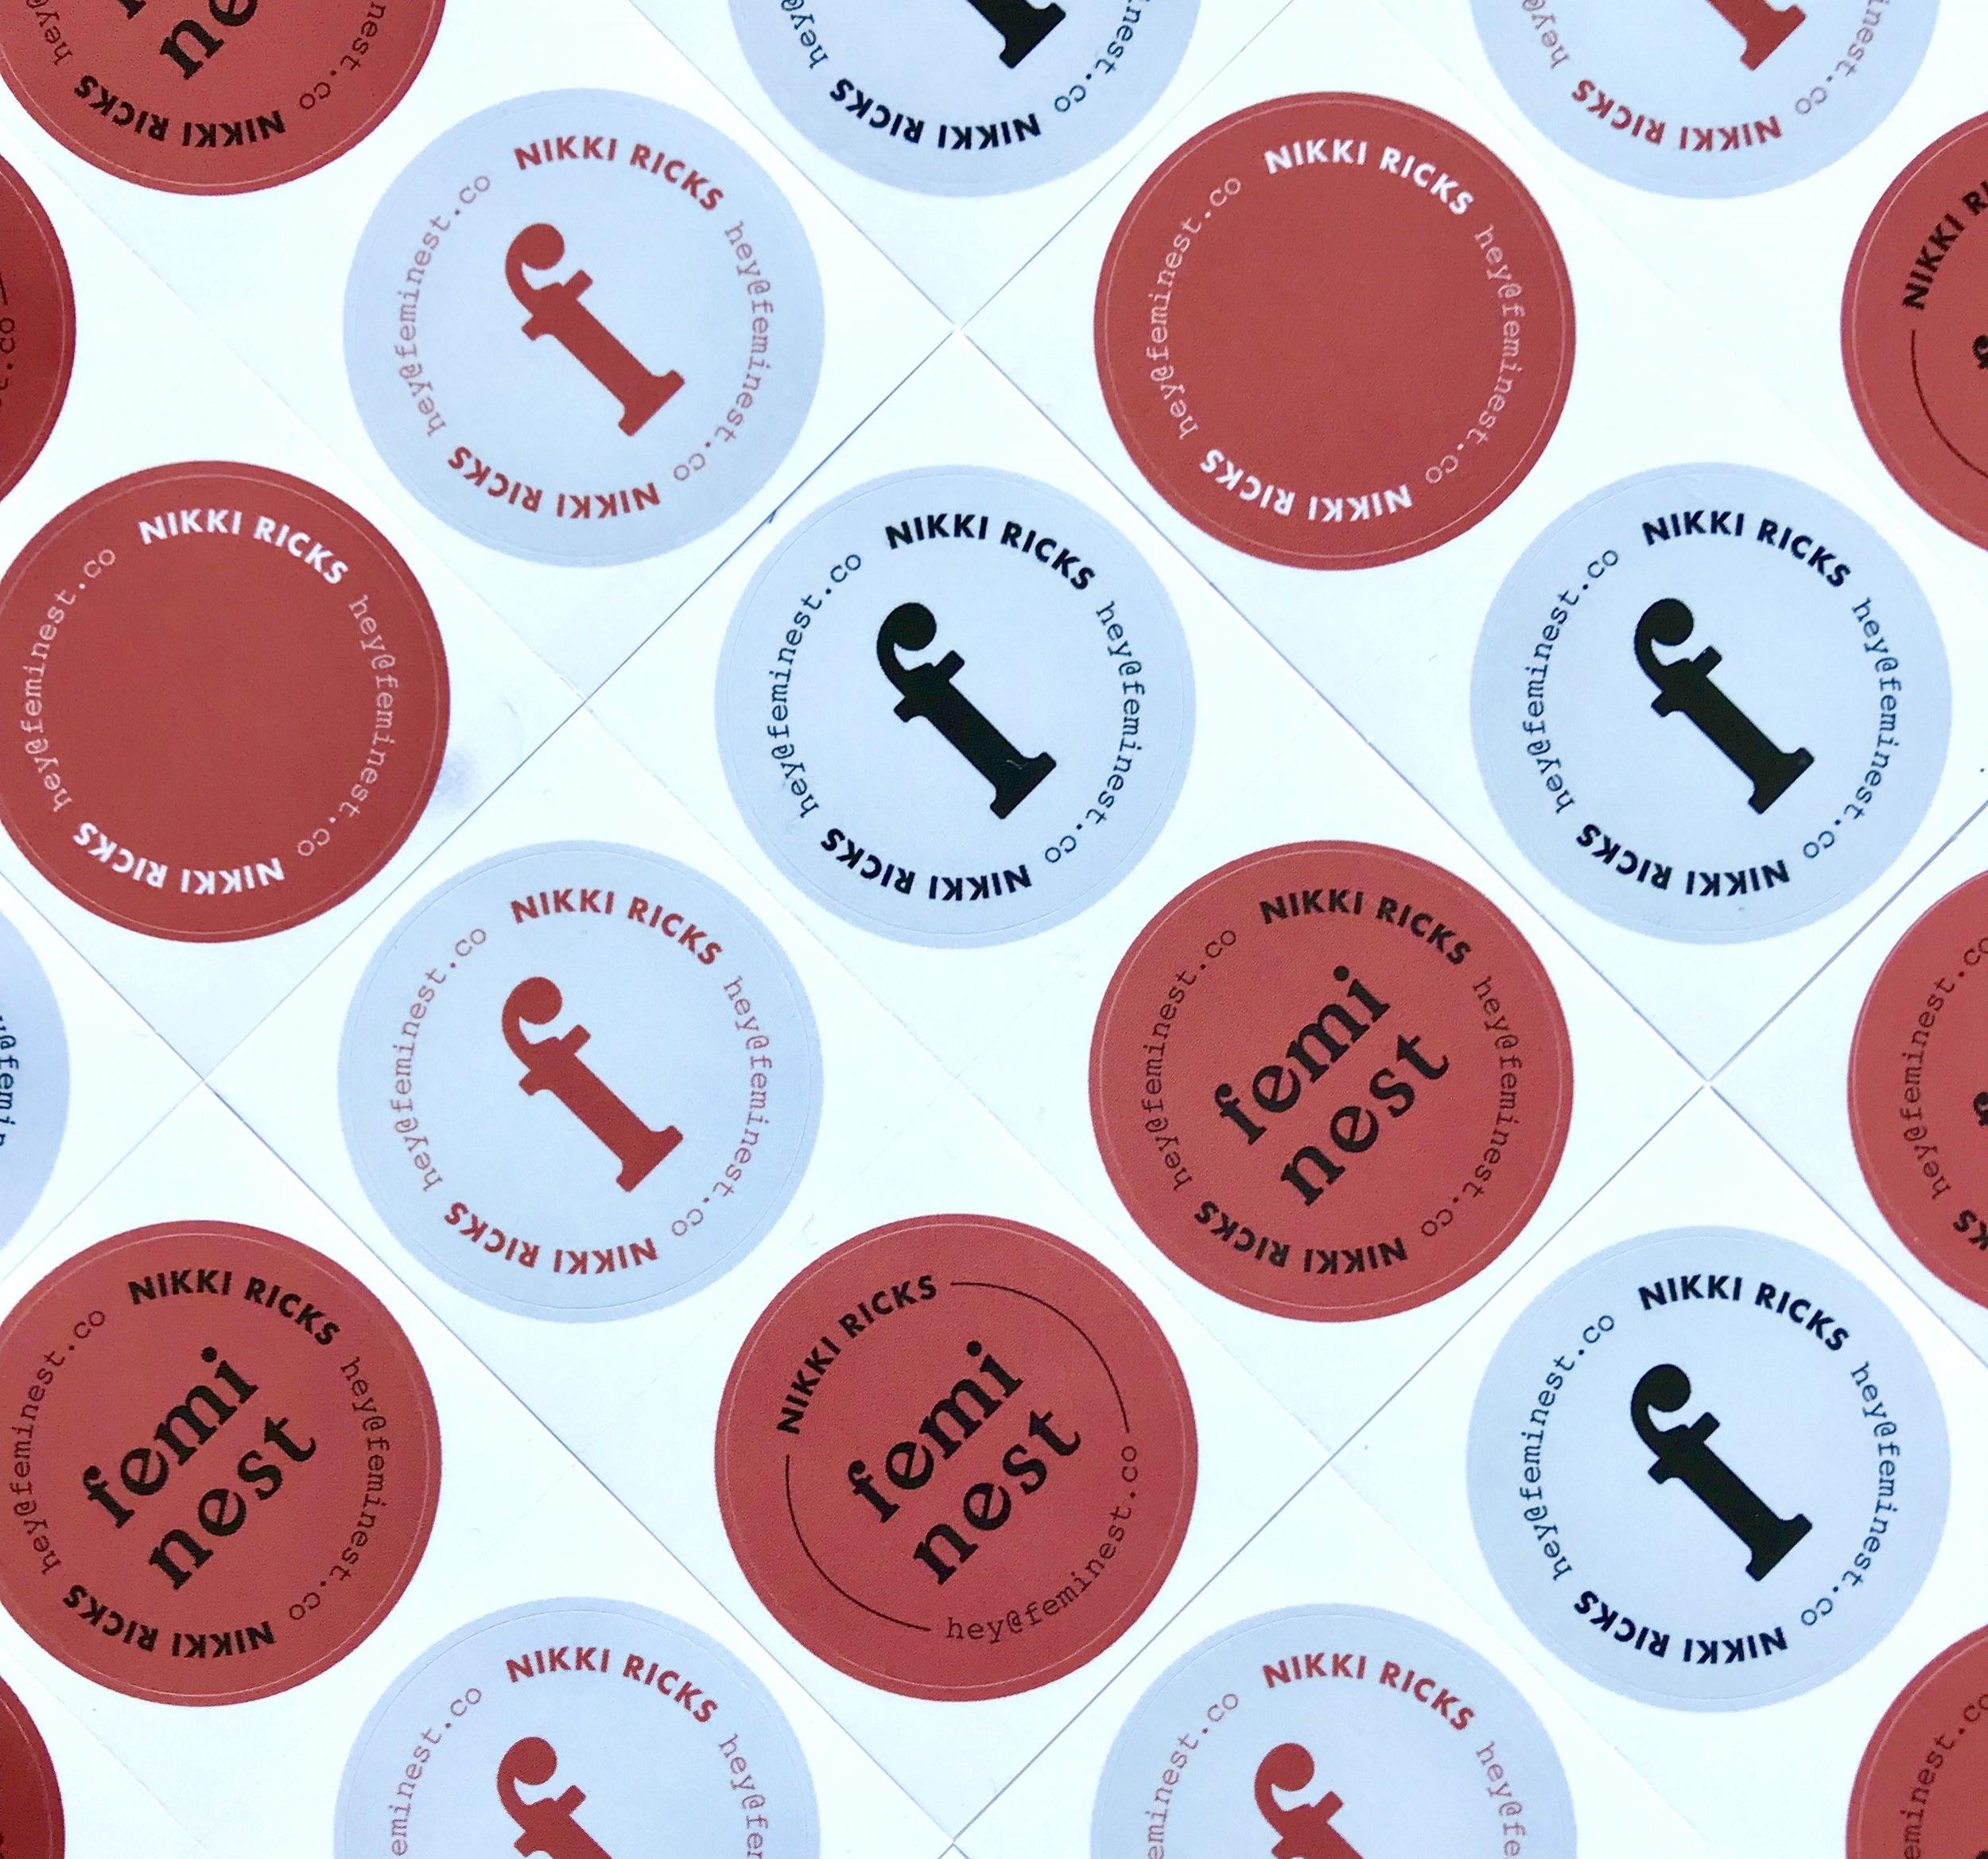 feminest business cards-stickers.JPG